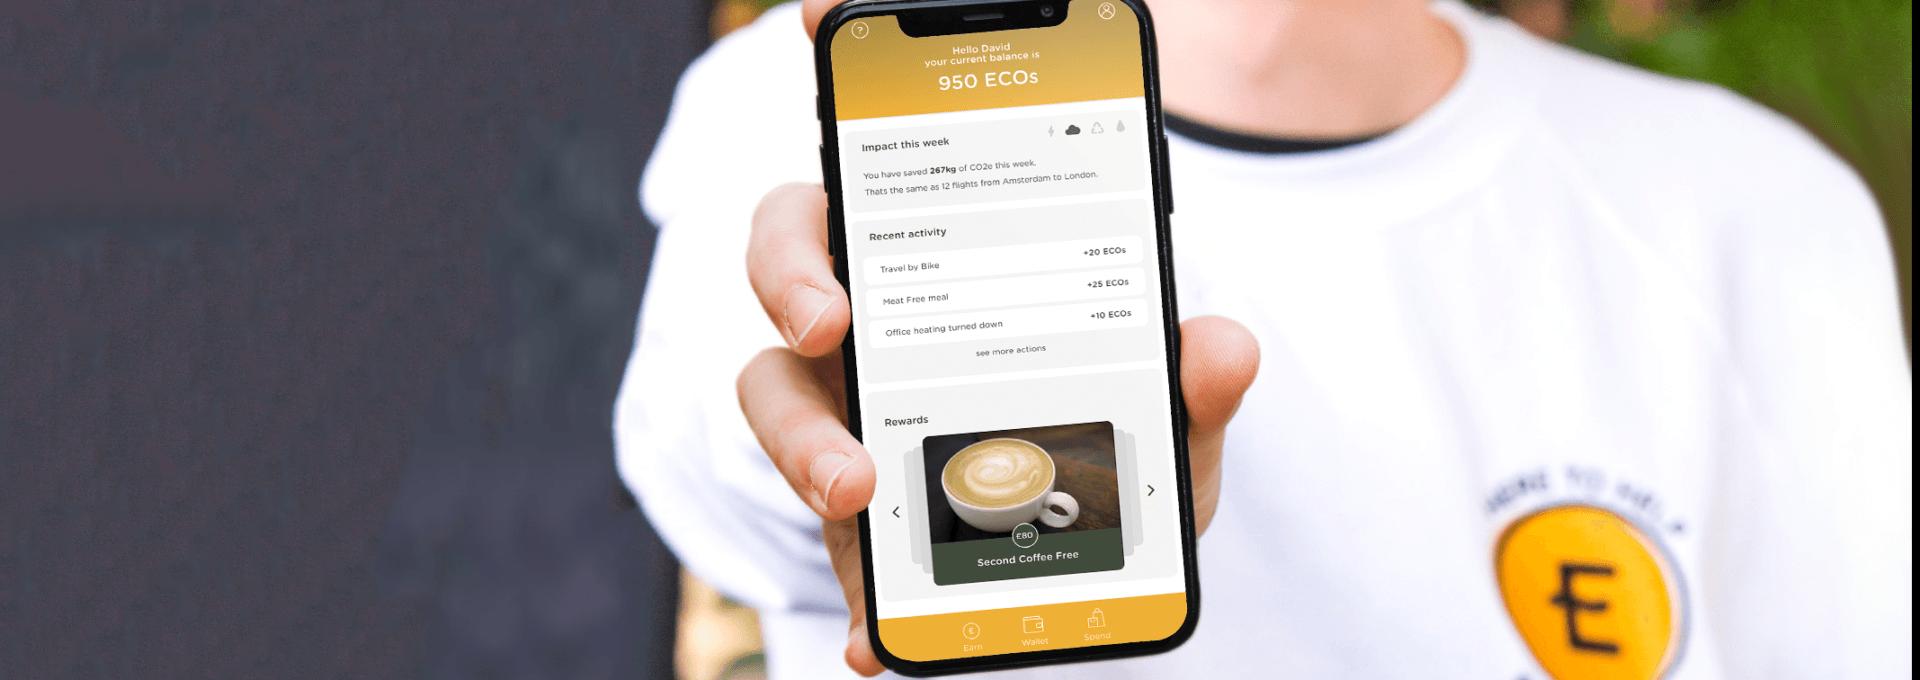 ECOcoin Wallet App